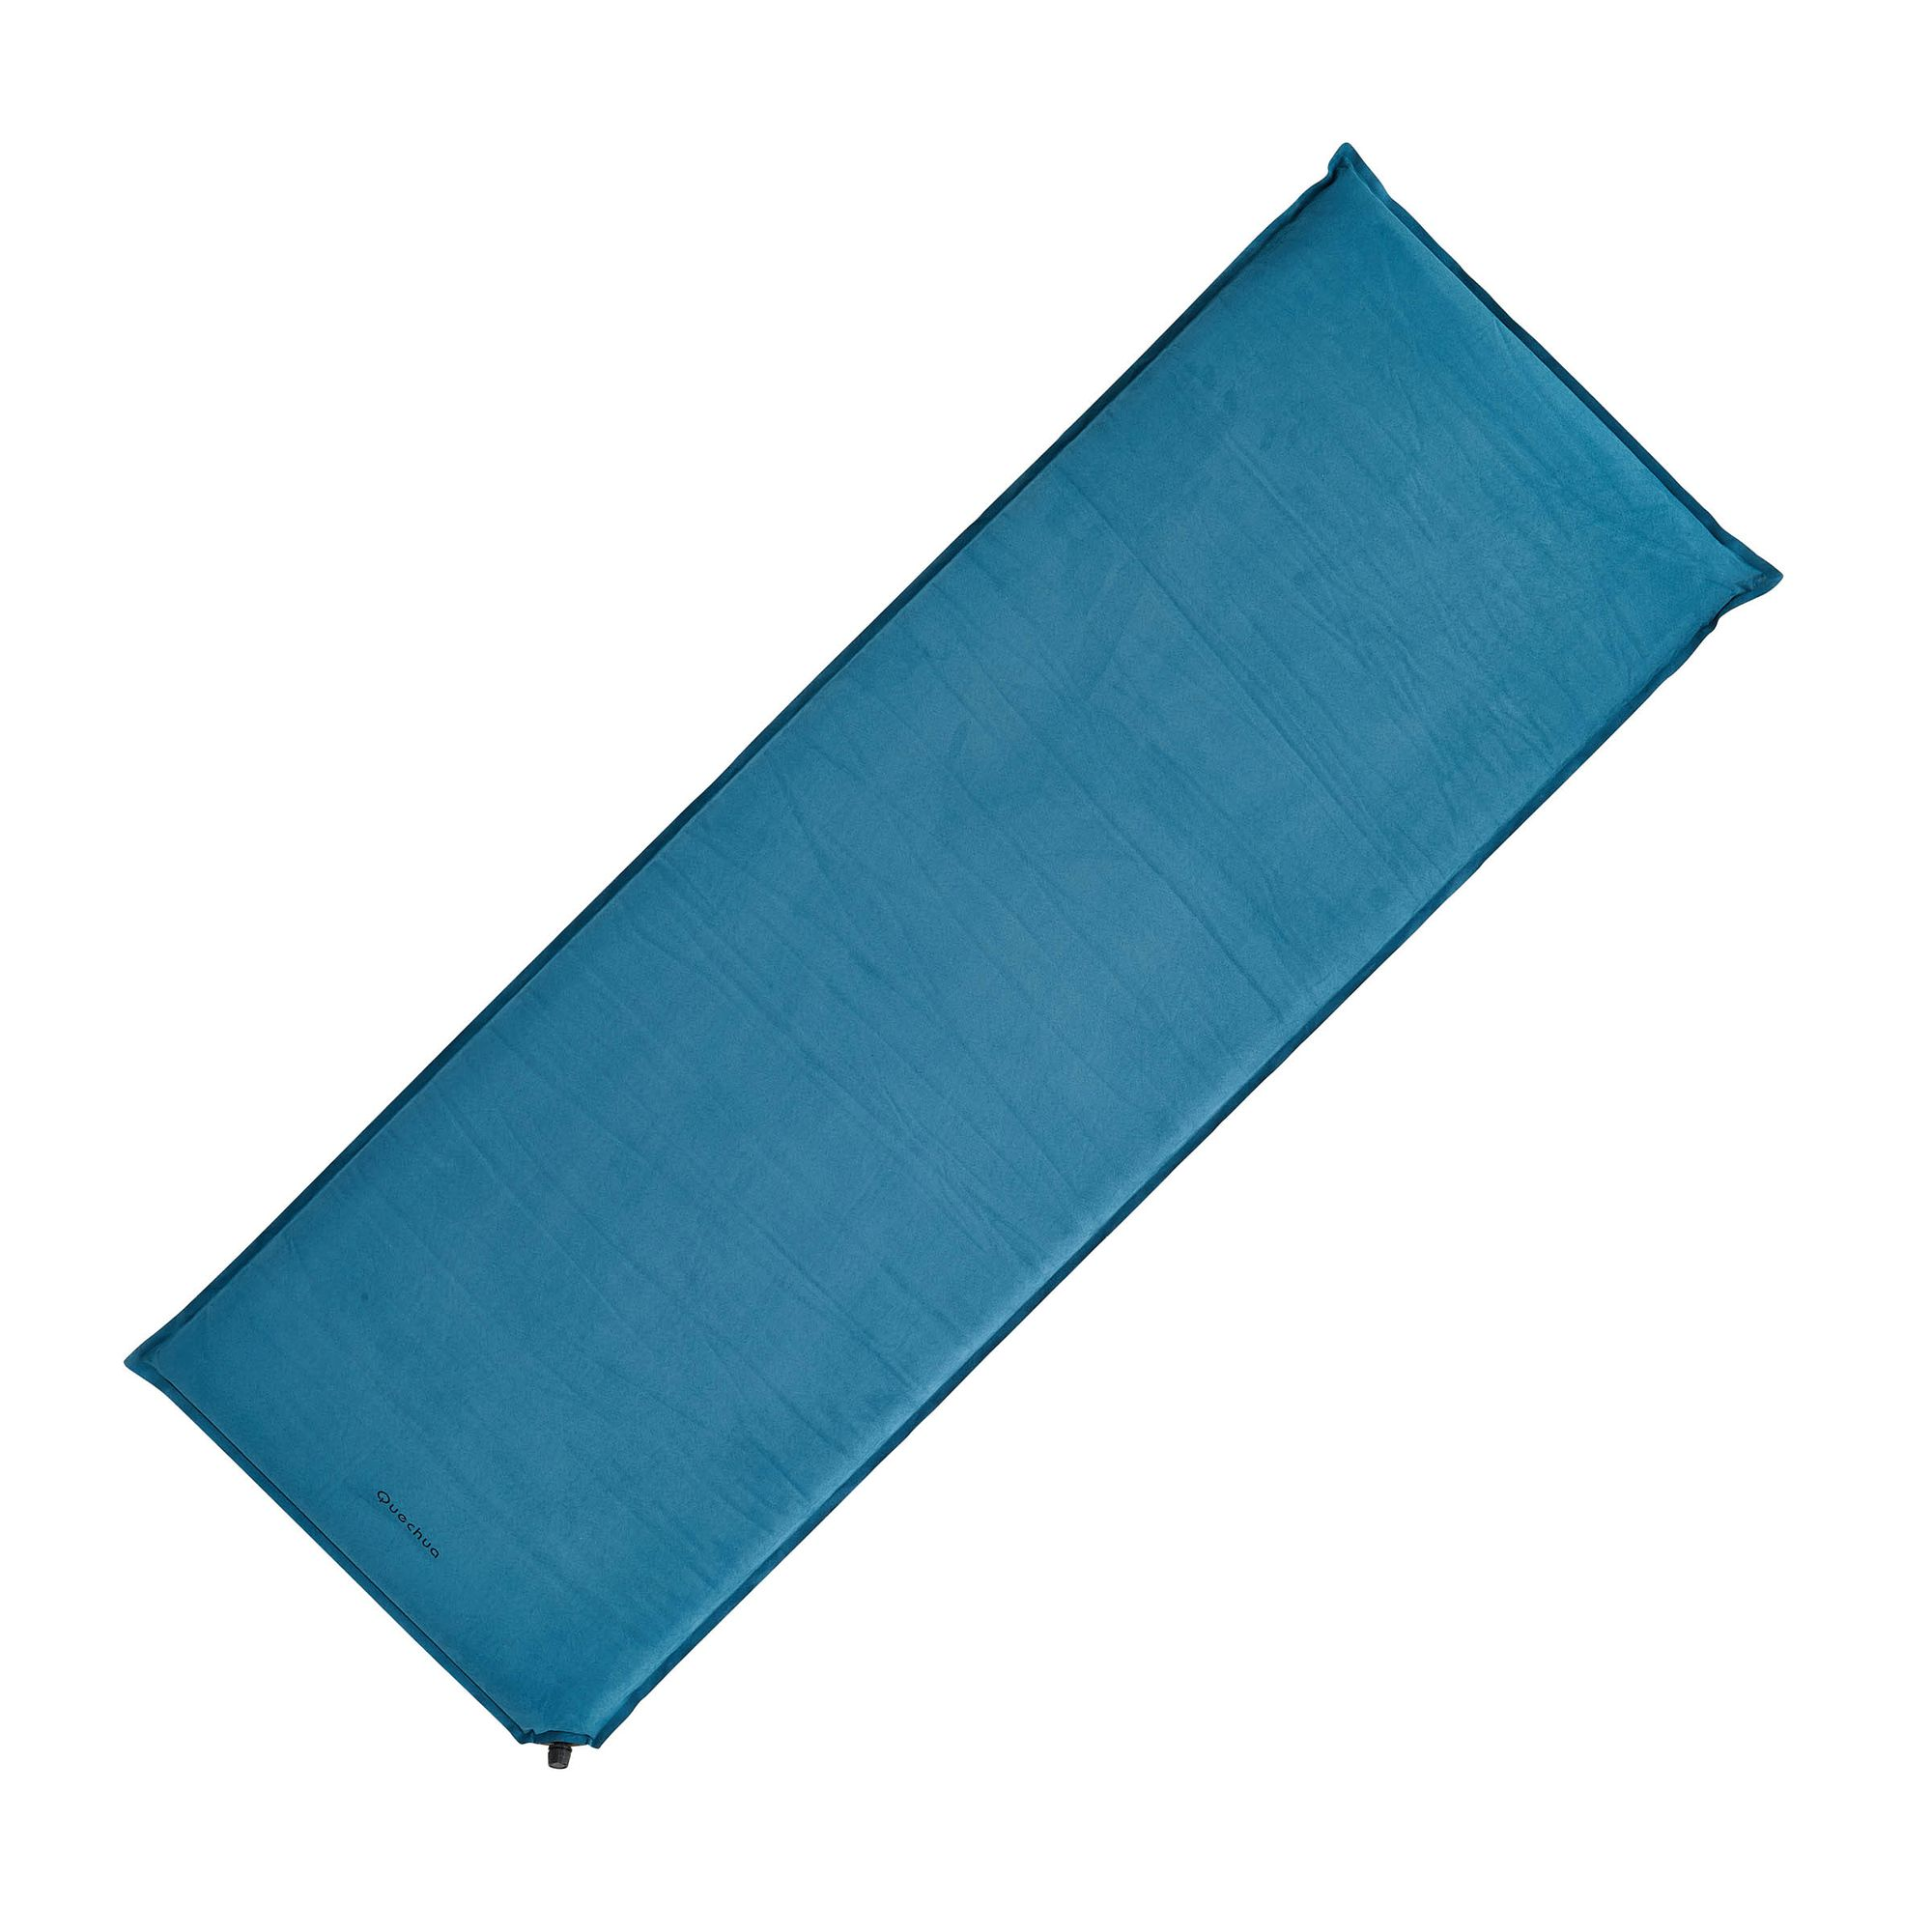 Matelas autogonflant de CAMPING / CAMP DU RANDONNEUR A300 | 1 pers. bleu